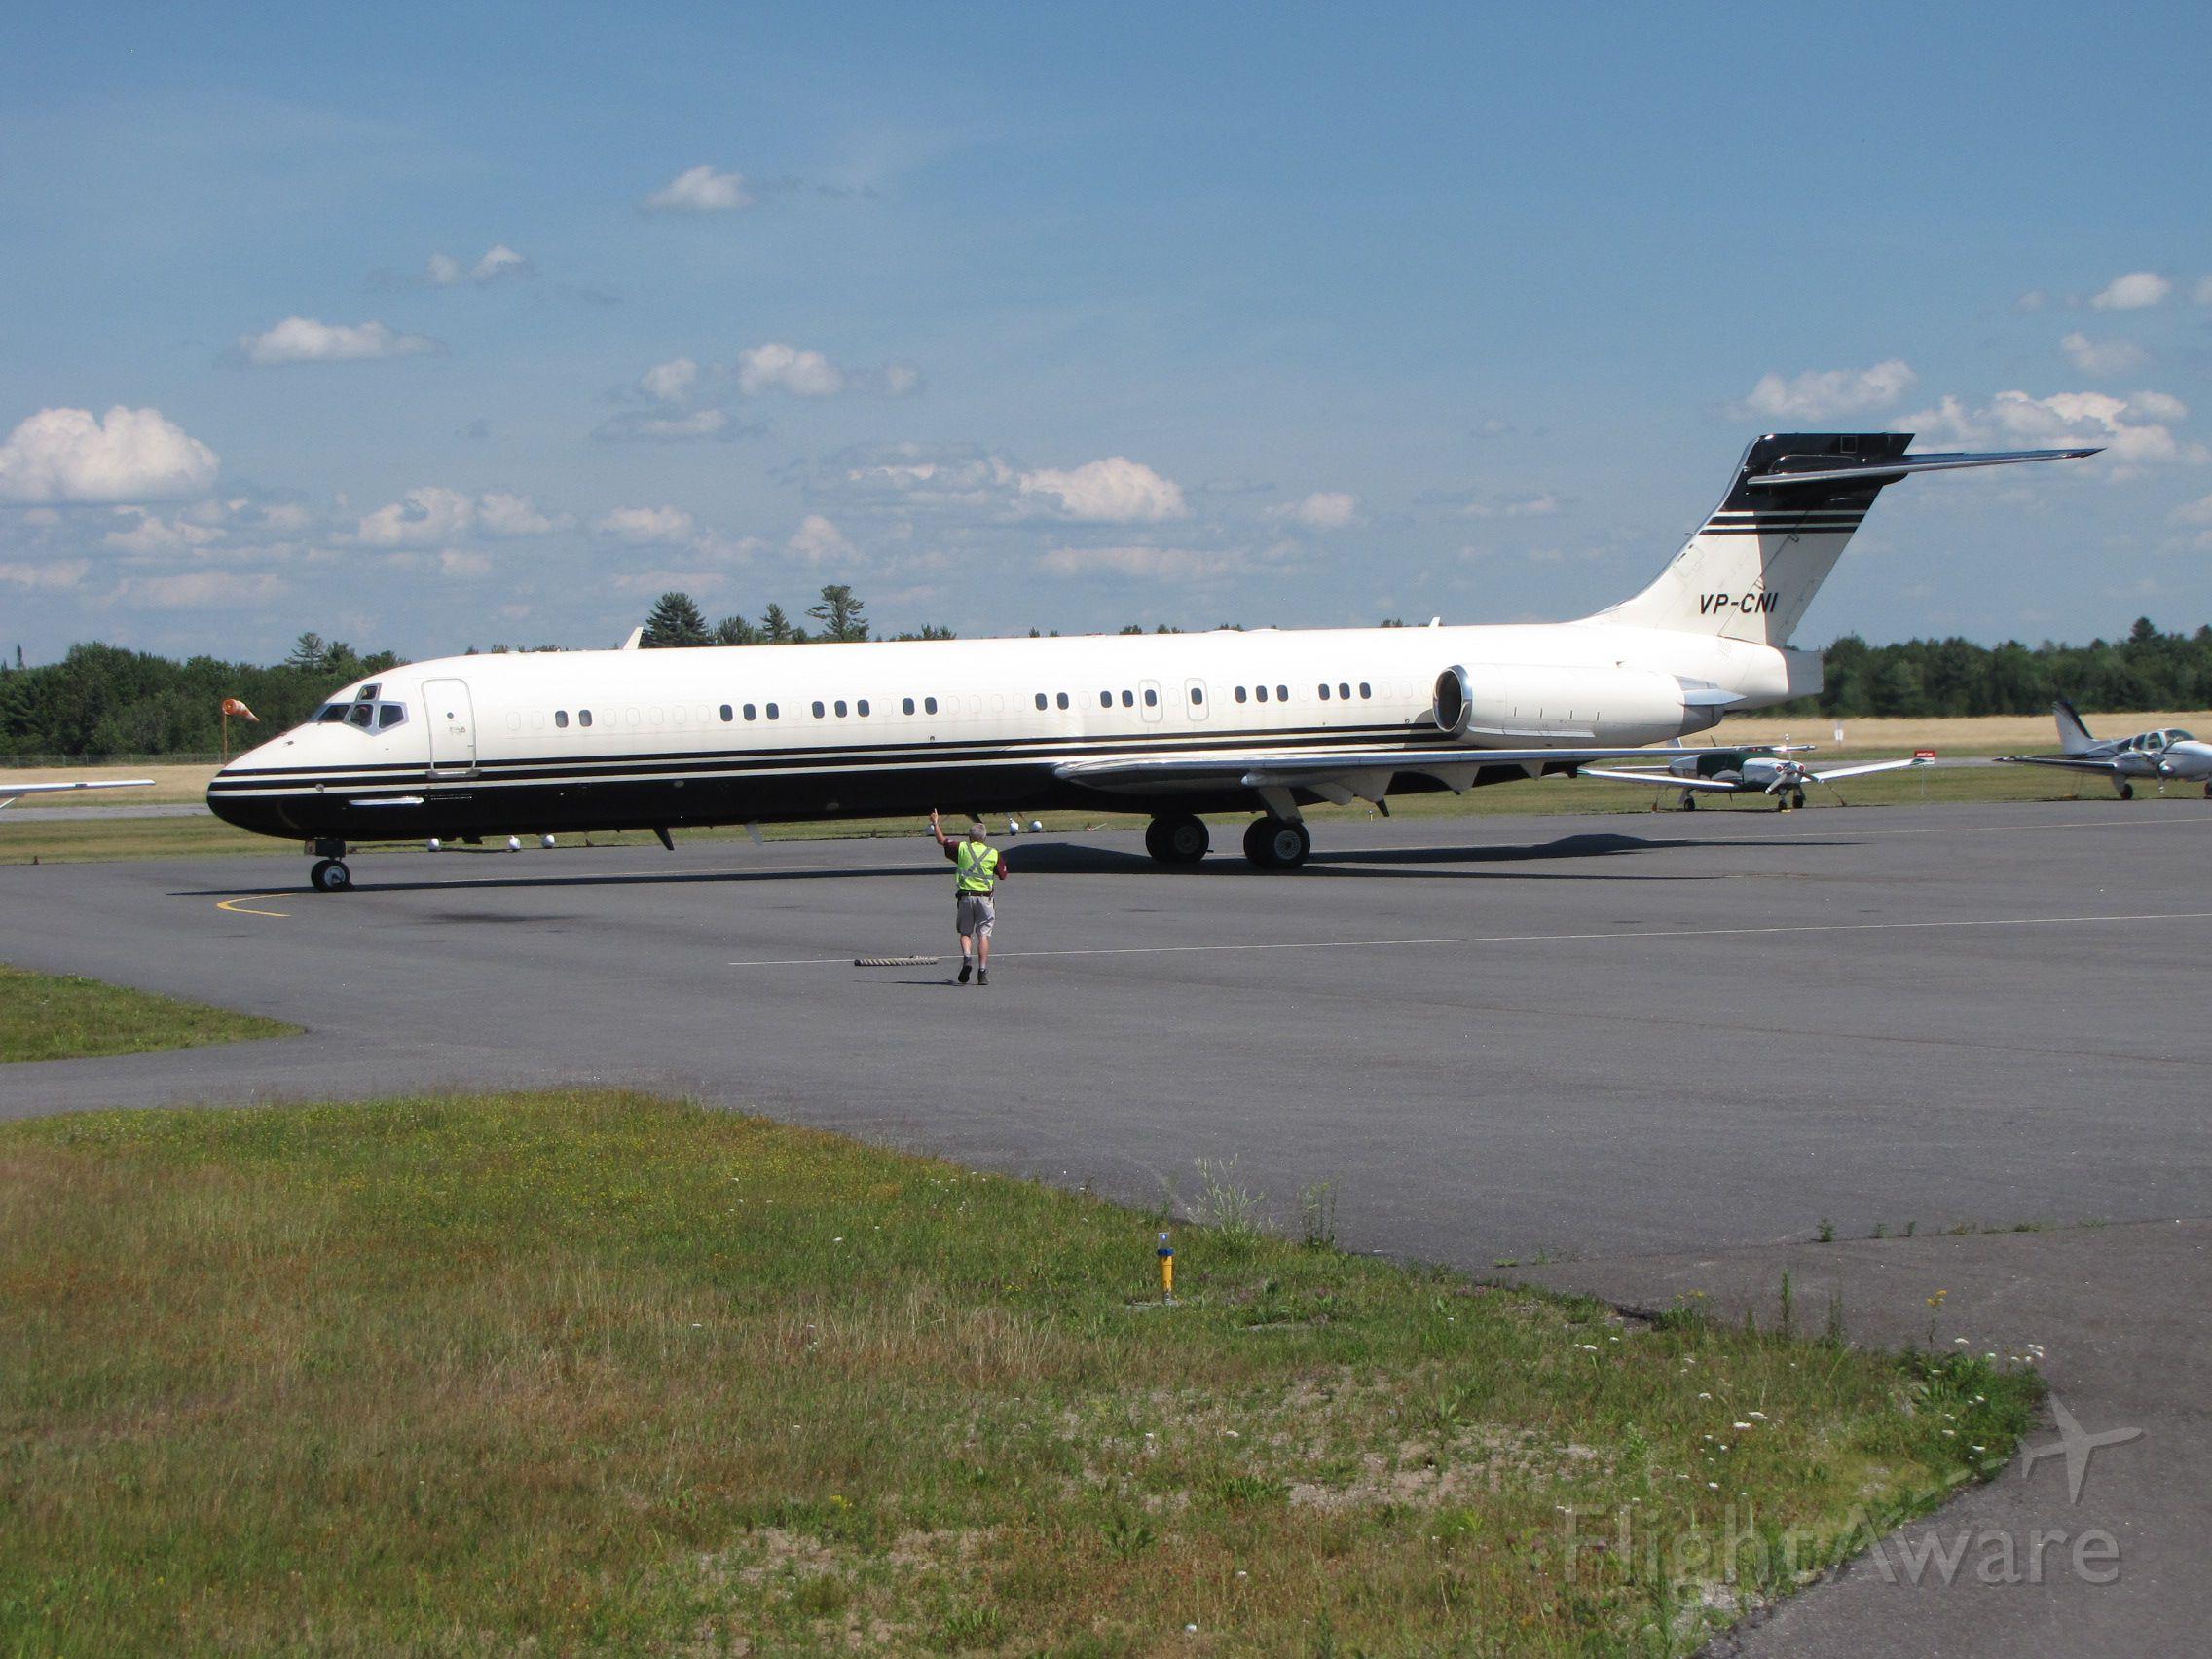 McDonnell Douglas MD-80 (VP-CNI) - guiding in